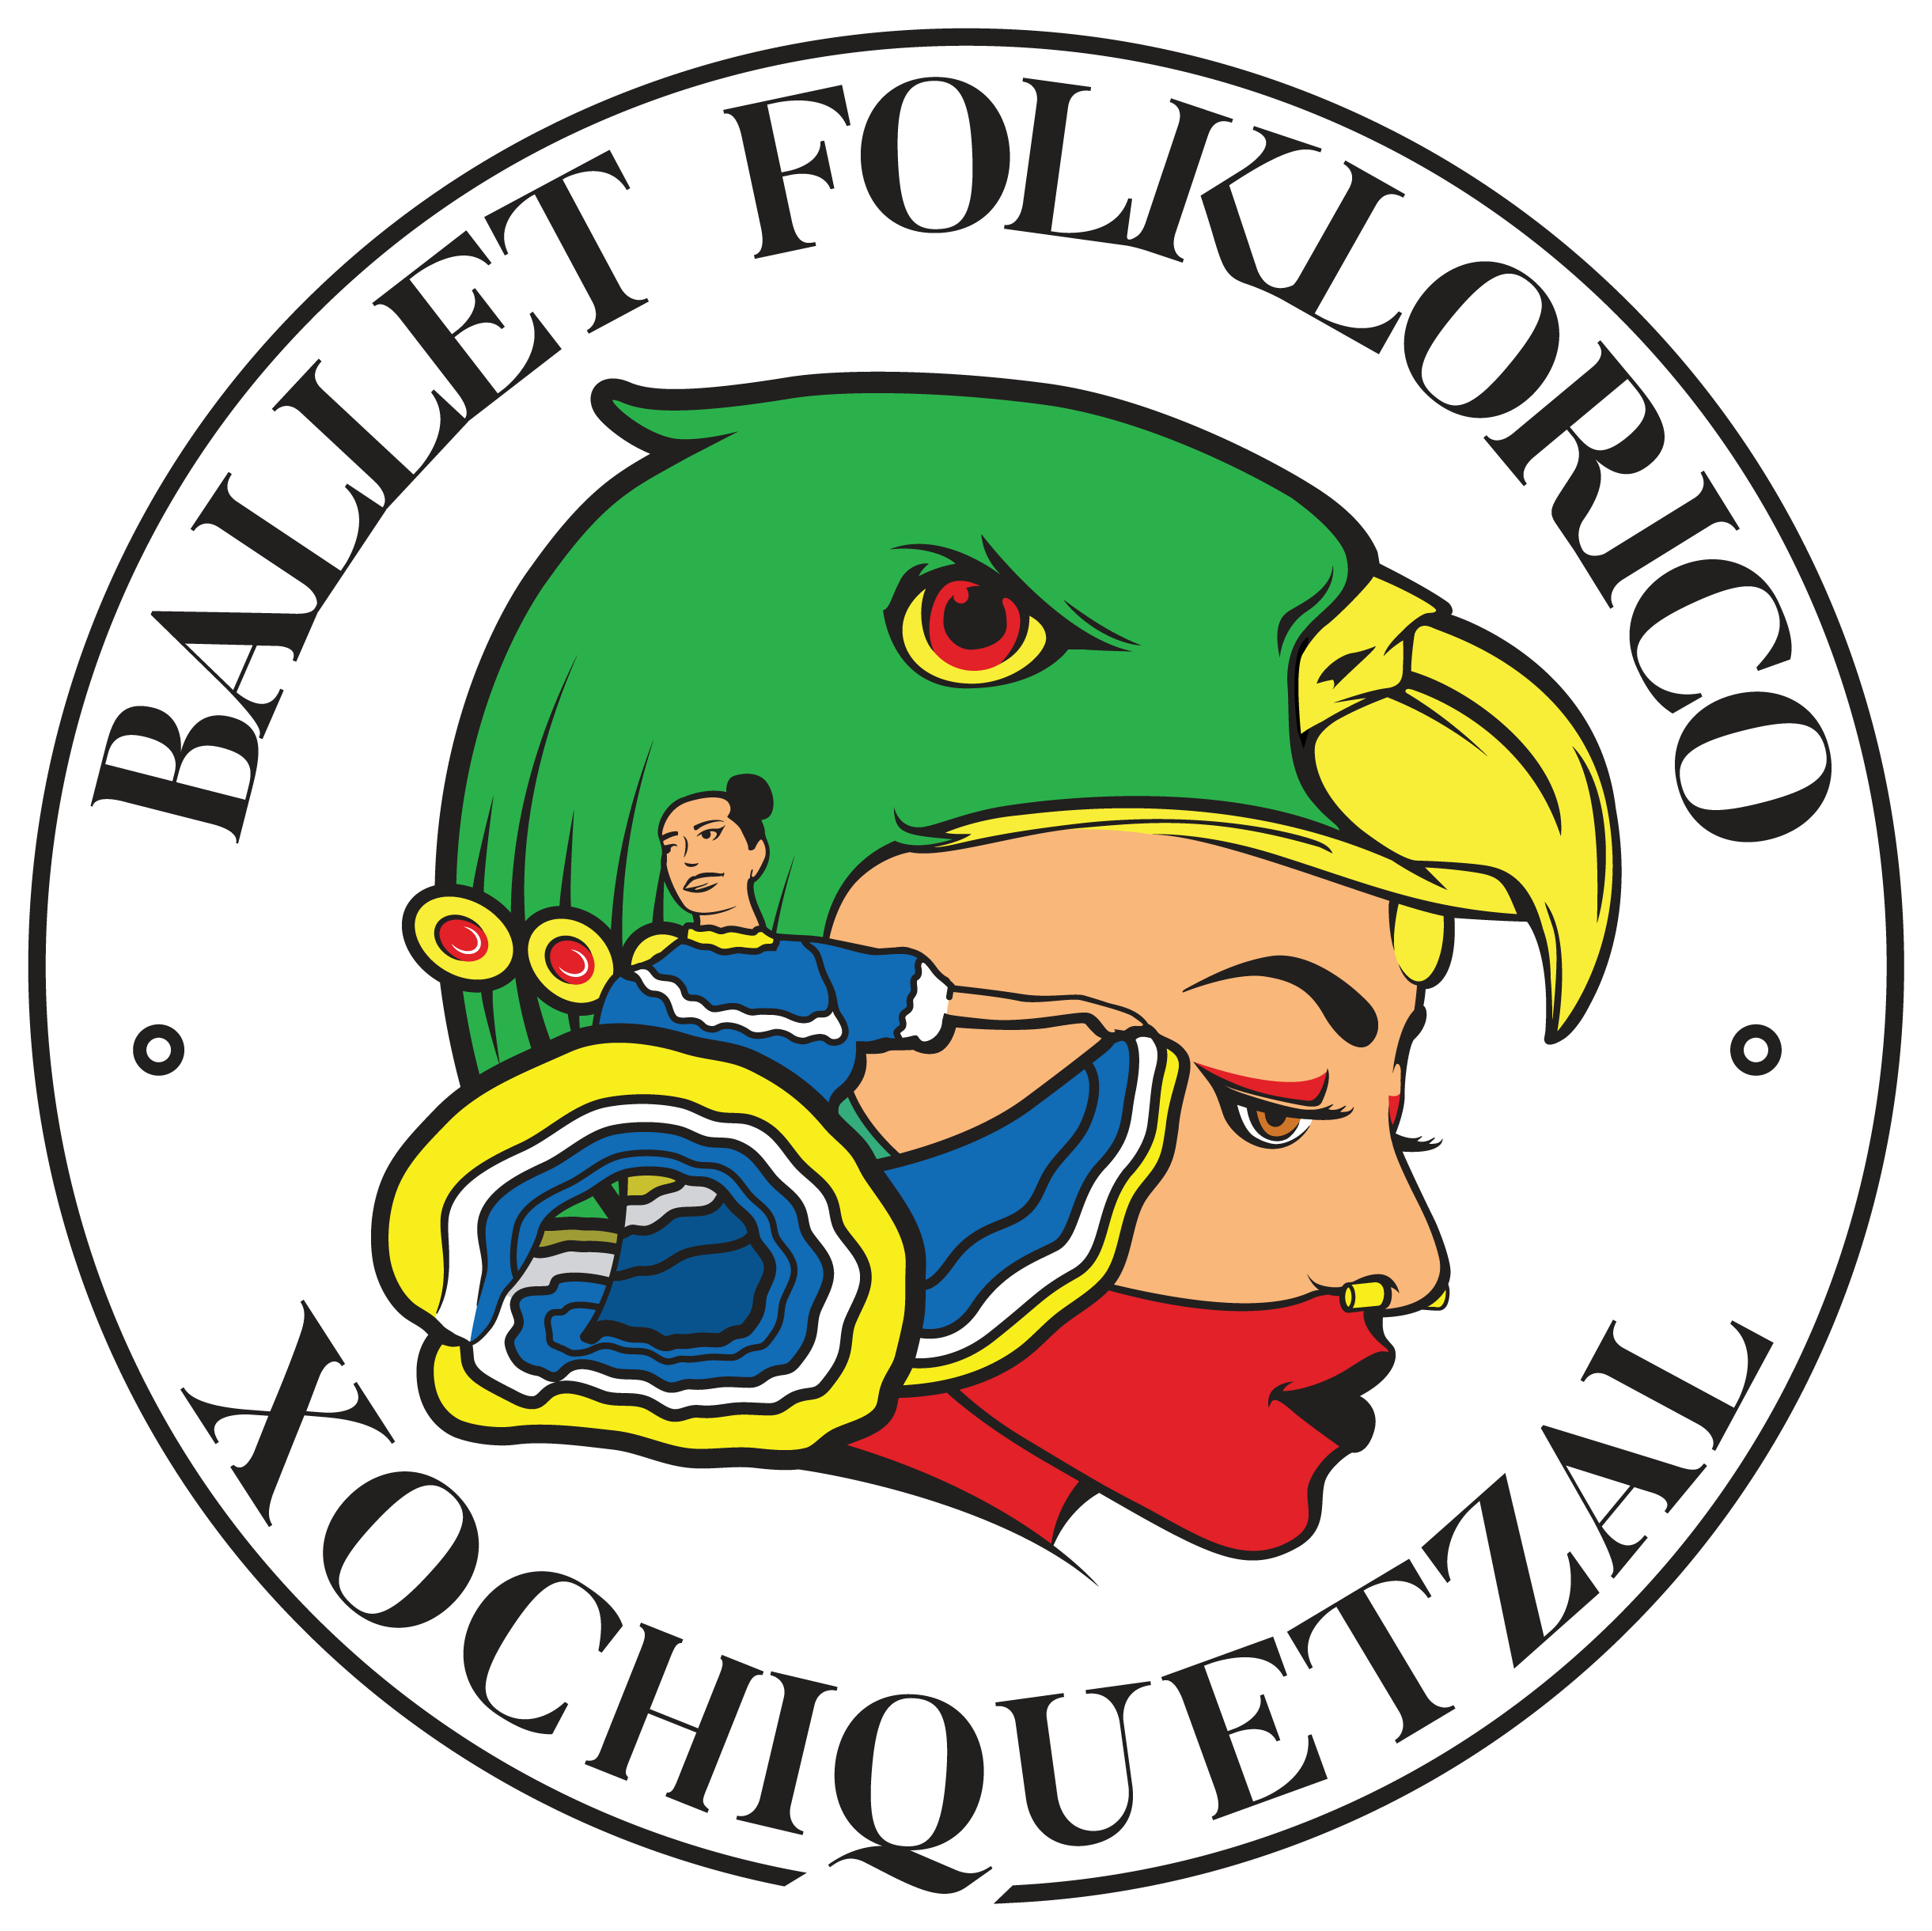 Ballet Folklorico Xochiquetzal - Based in Rochelle Illinois